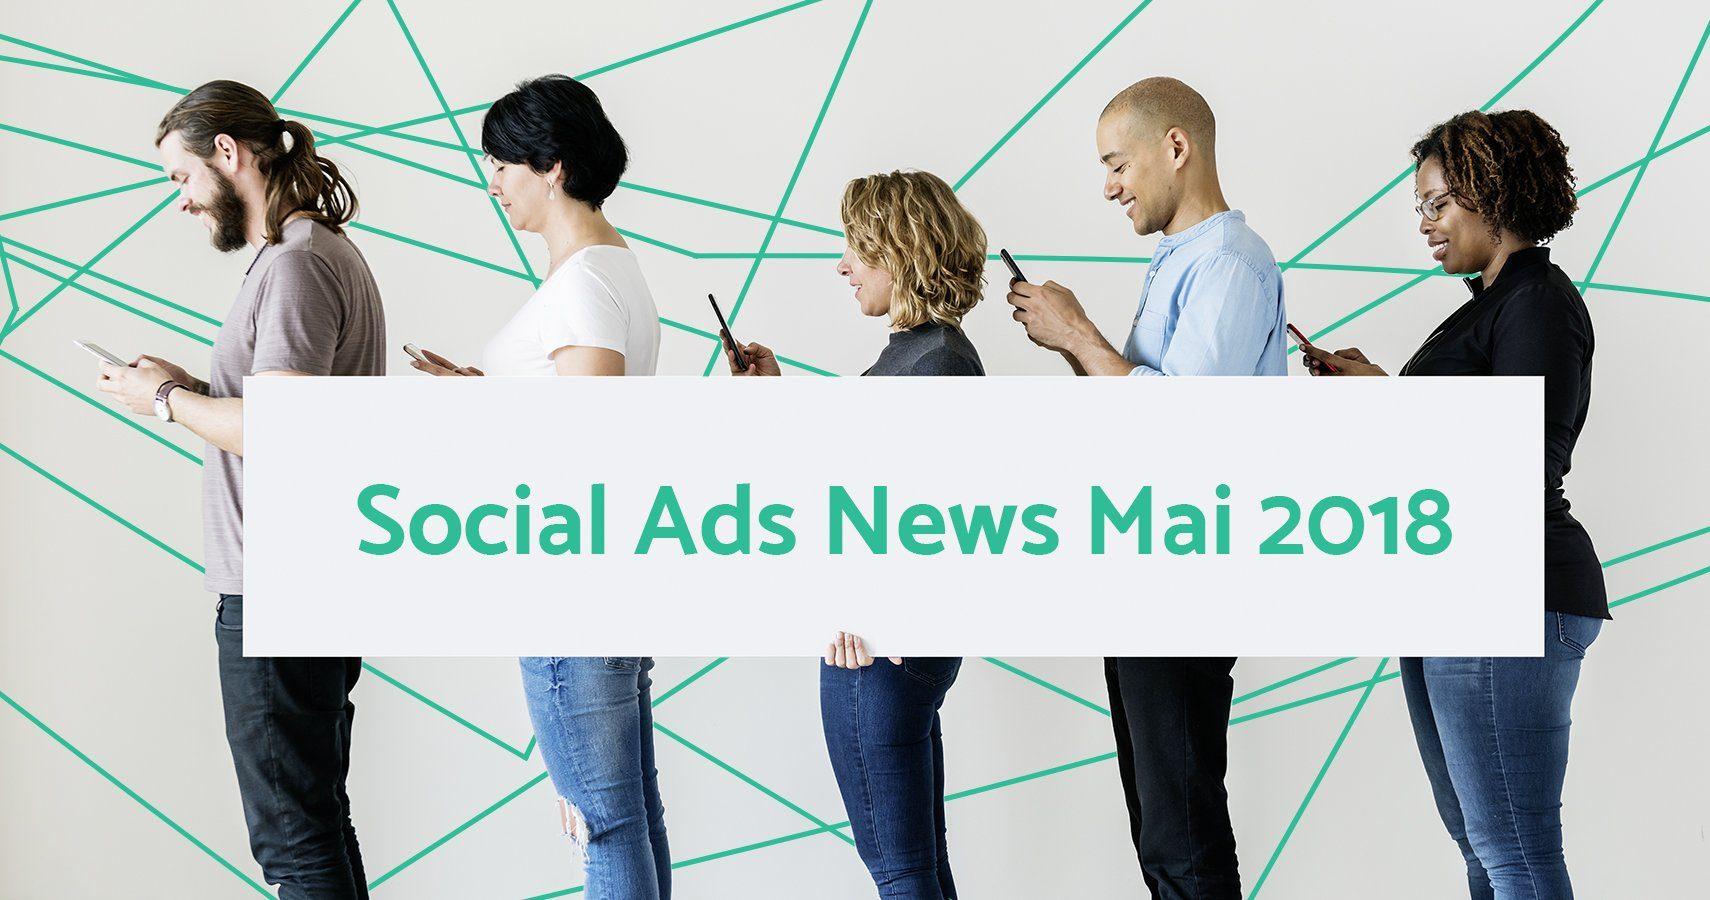 adseed - Social Ads News Mai 2018